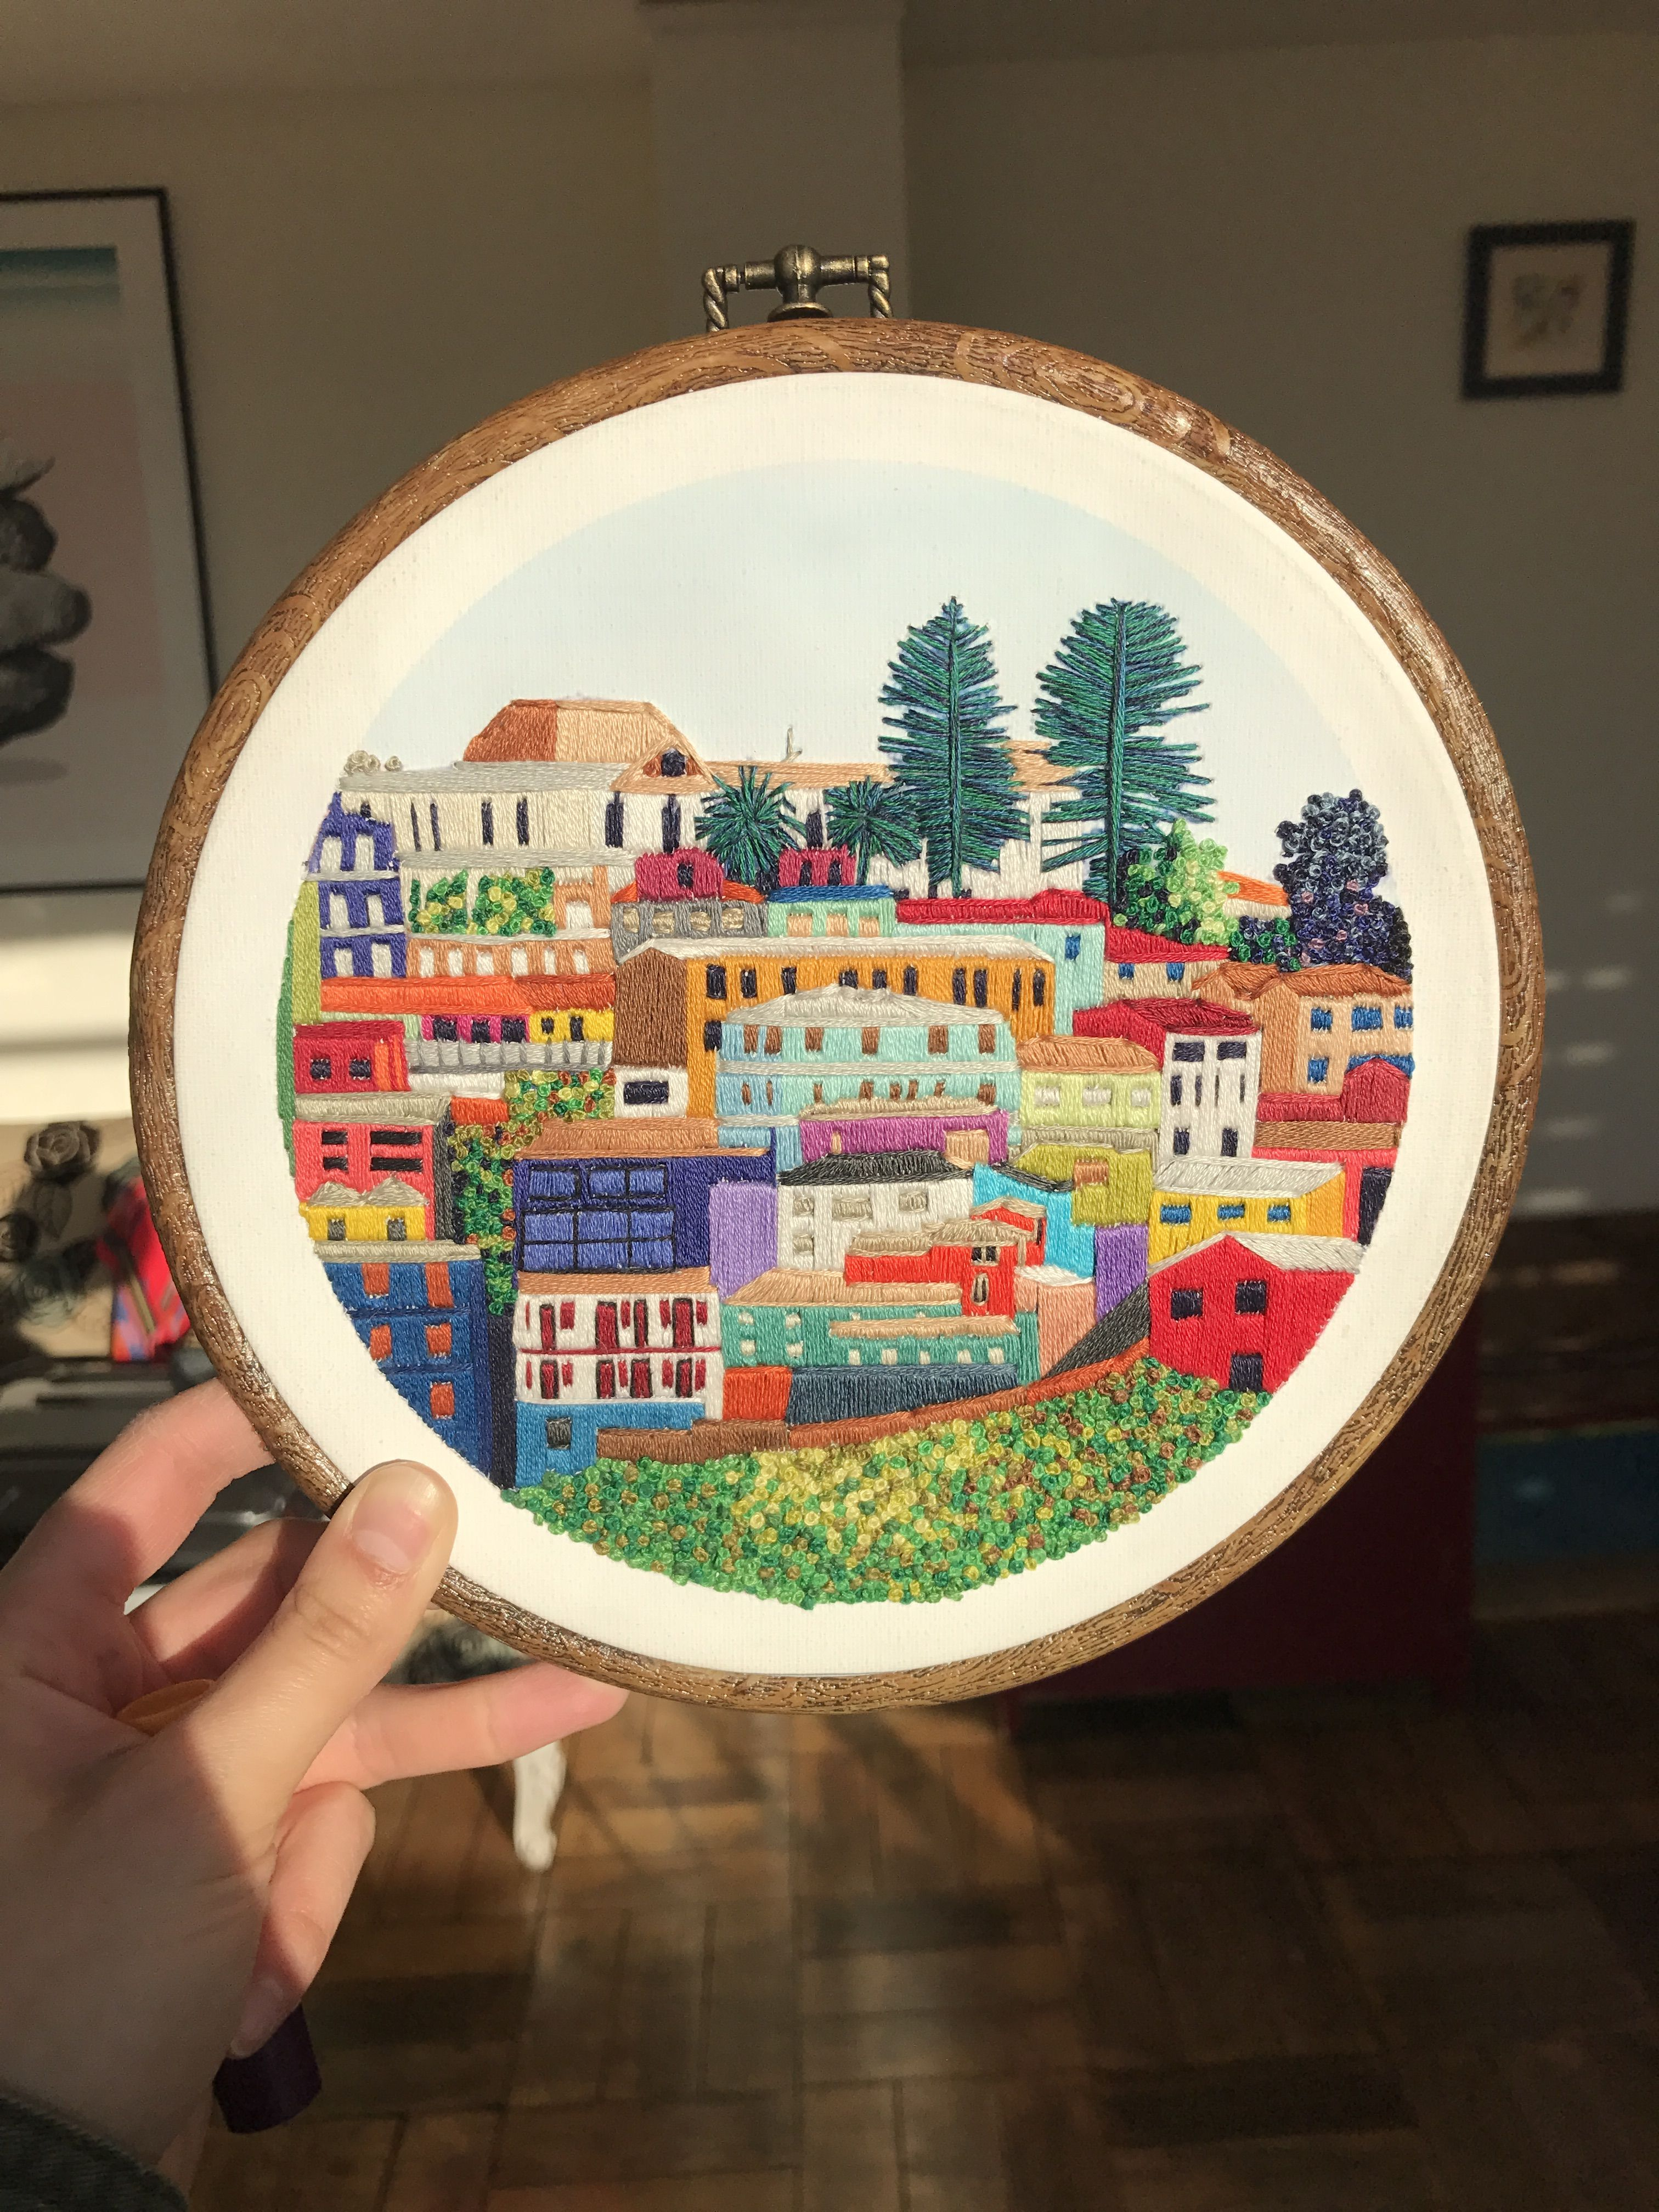 bordado #valparaiso | Knit | Pinterest | Valparaiso, Bordado y ...